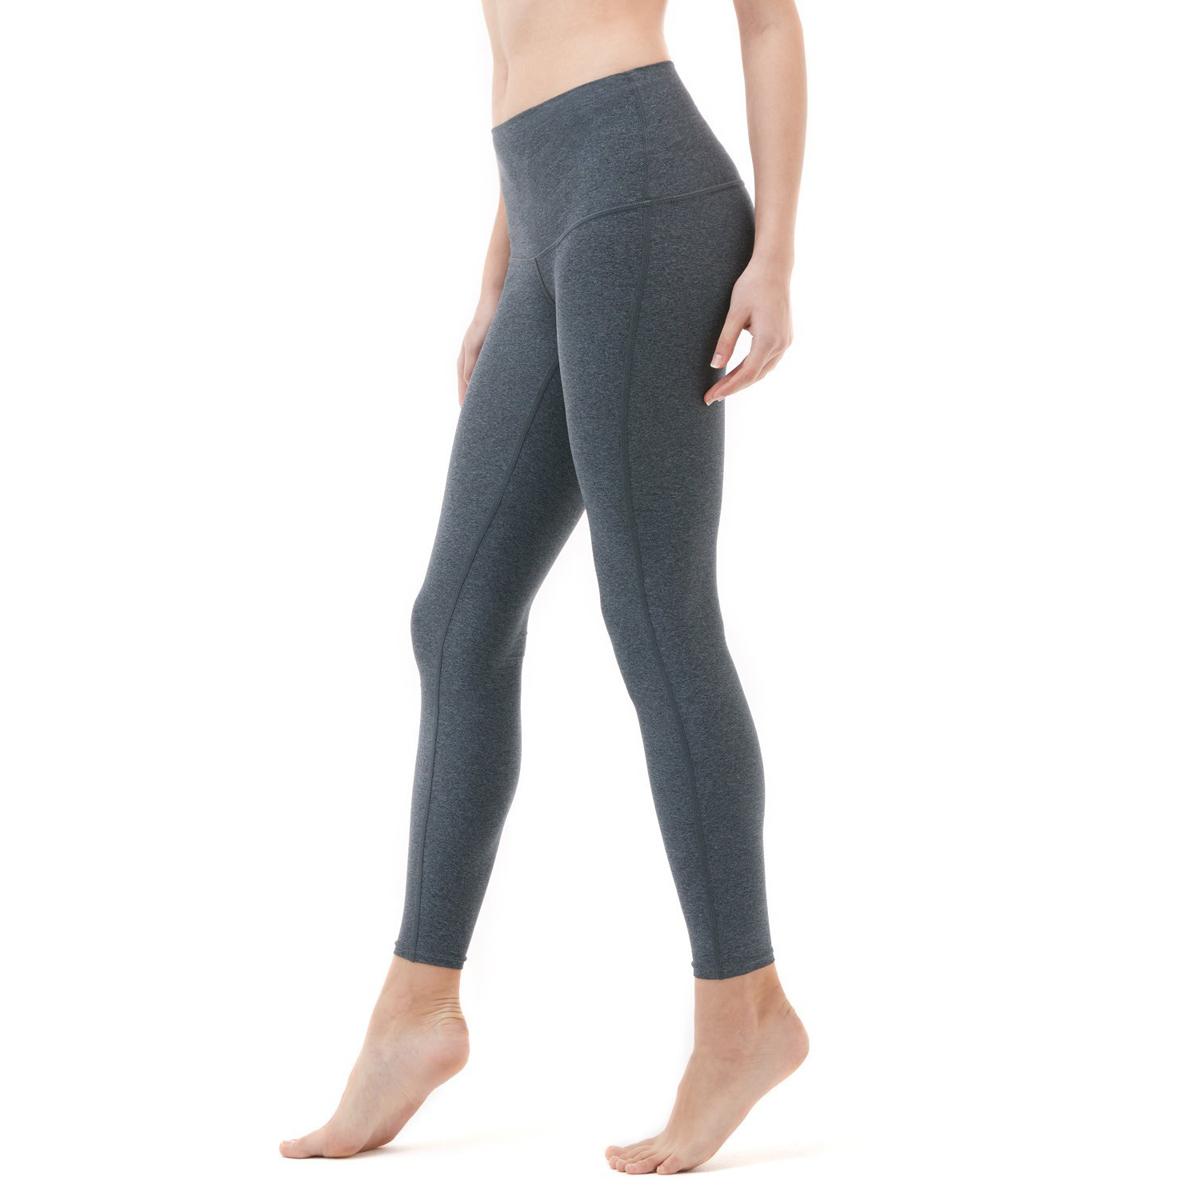 thumbnail 9 - TSLA Tesla FYP42 Women's High-Waisted Ultra-Stretch Tummy Control Yoga Pants